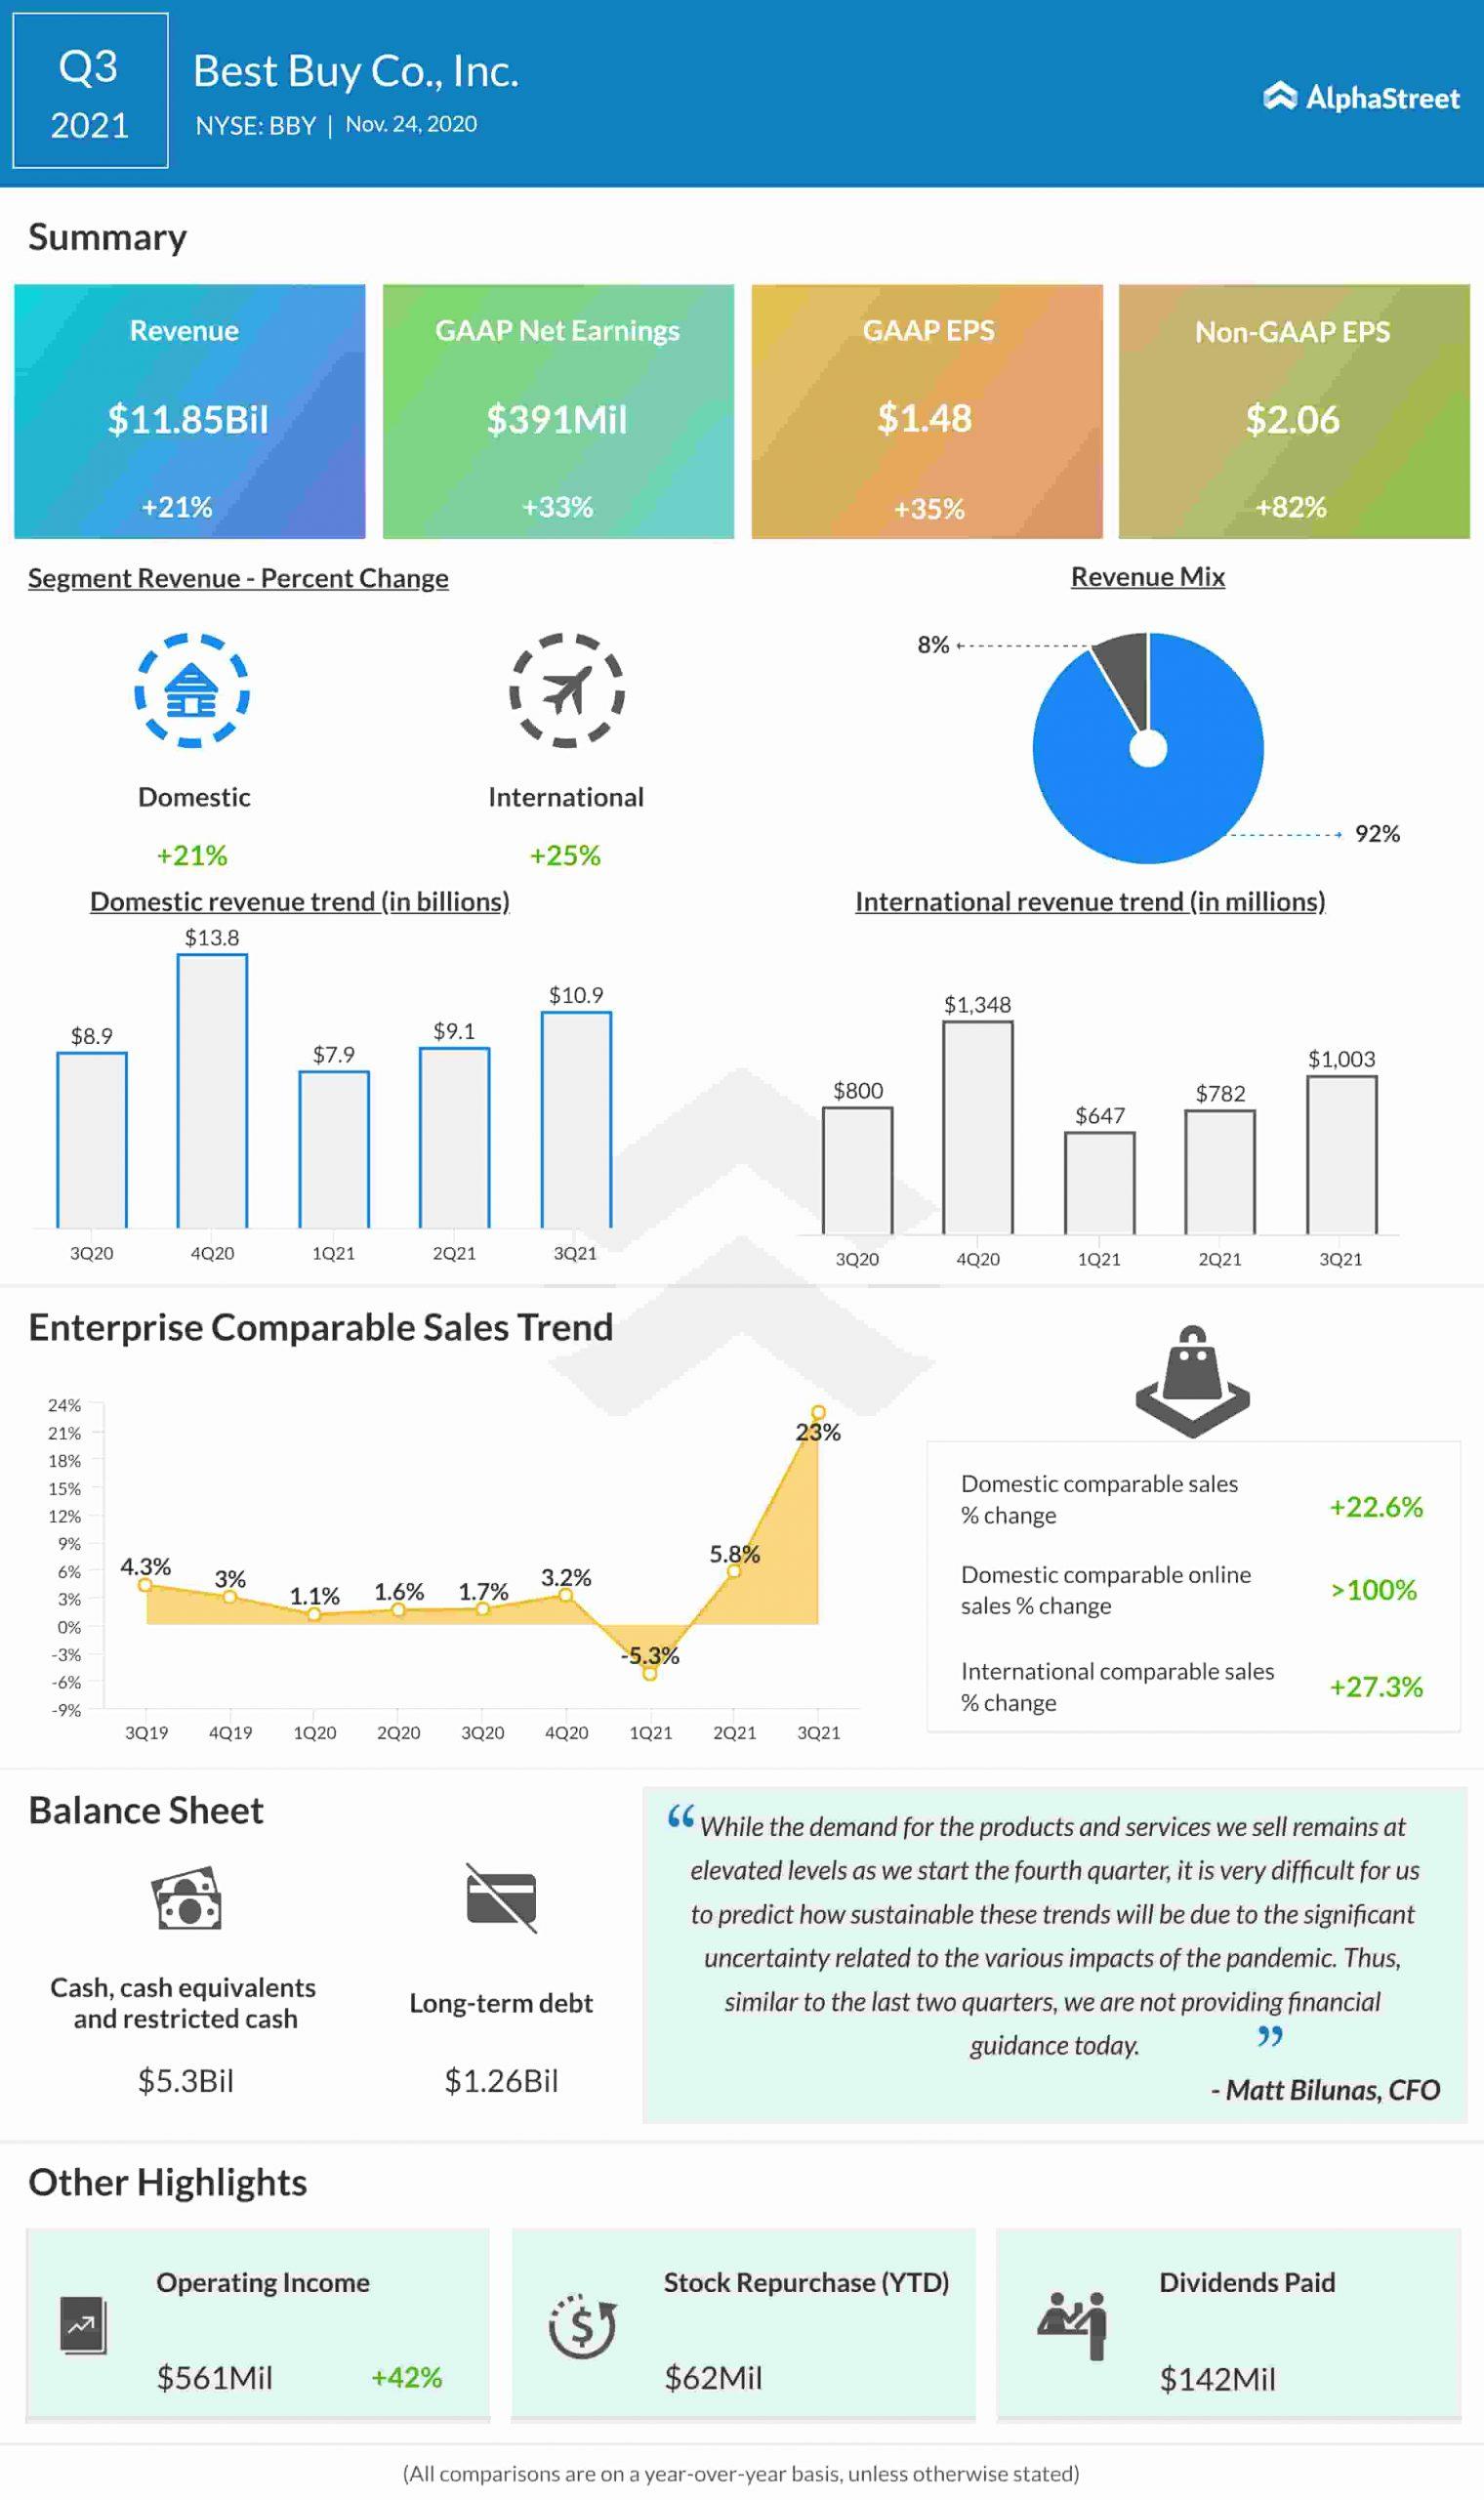 Best Buy Q3 2021 earnings infographic